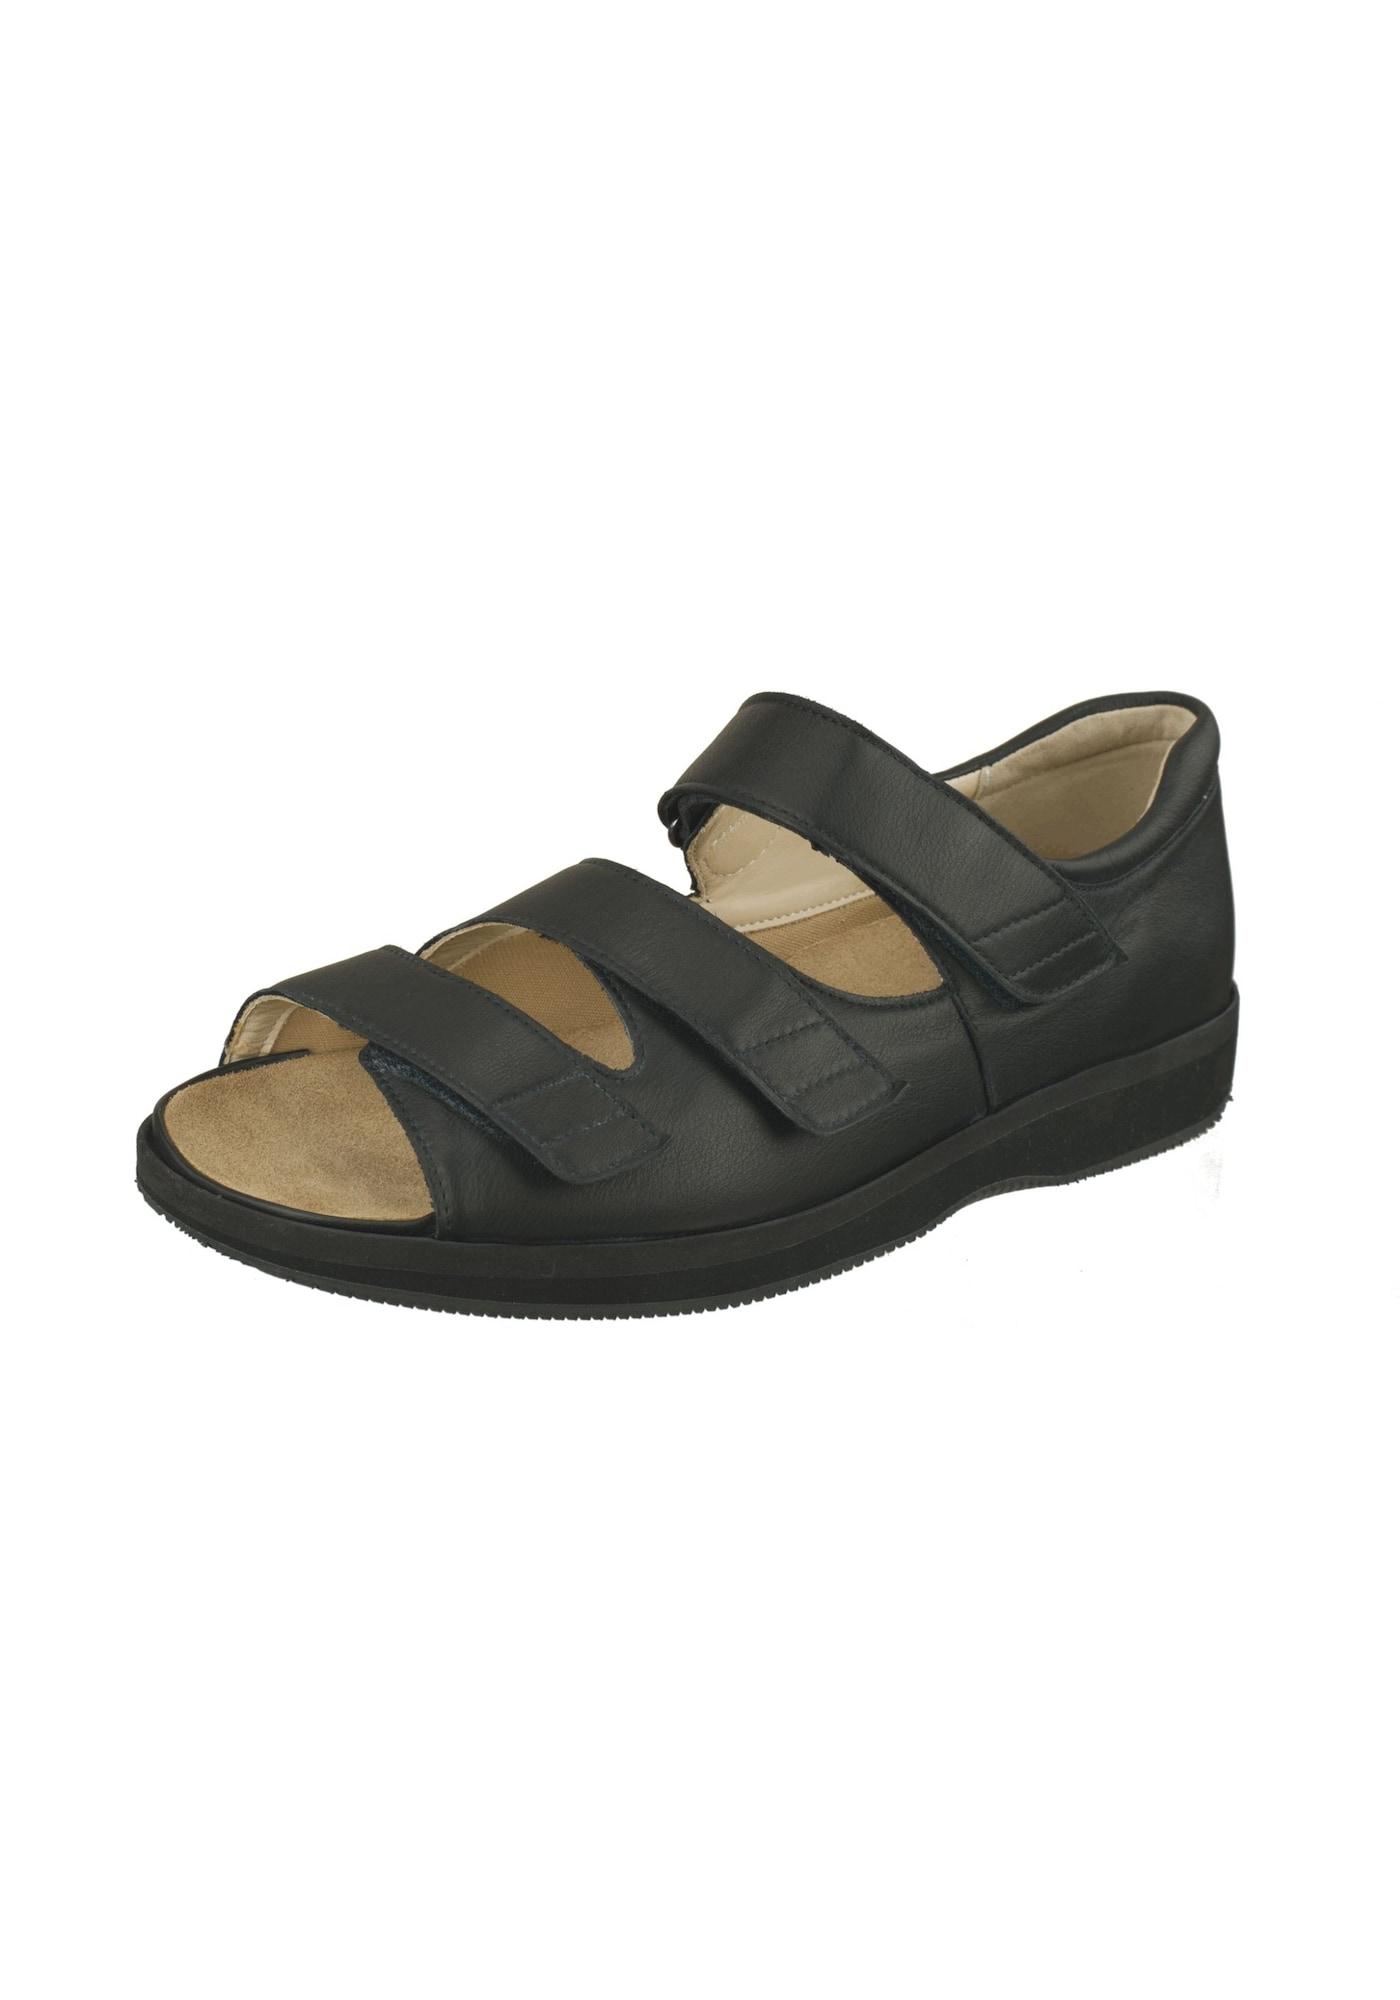 Sandalen 'Marokko' Natural Feet